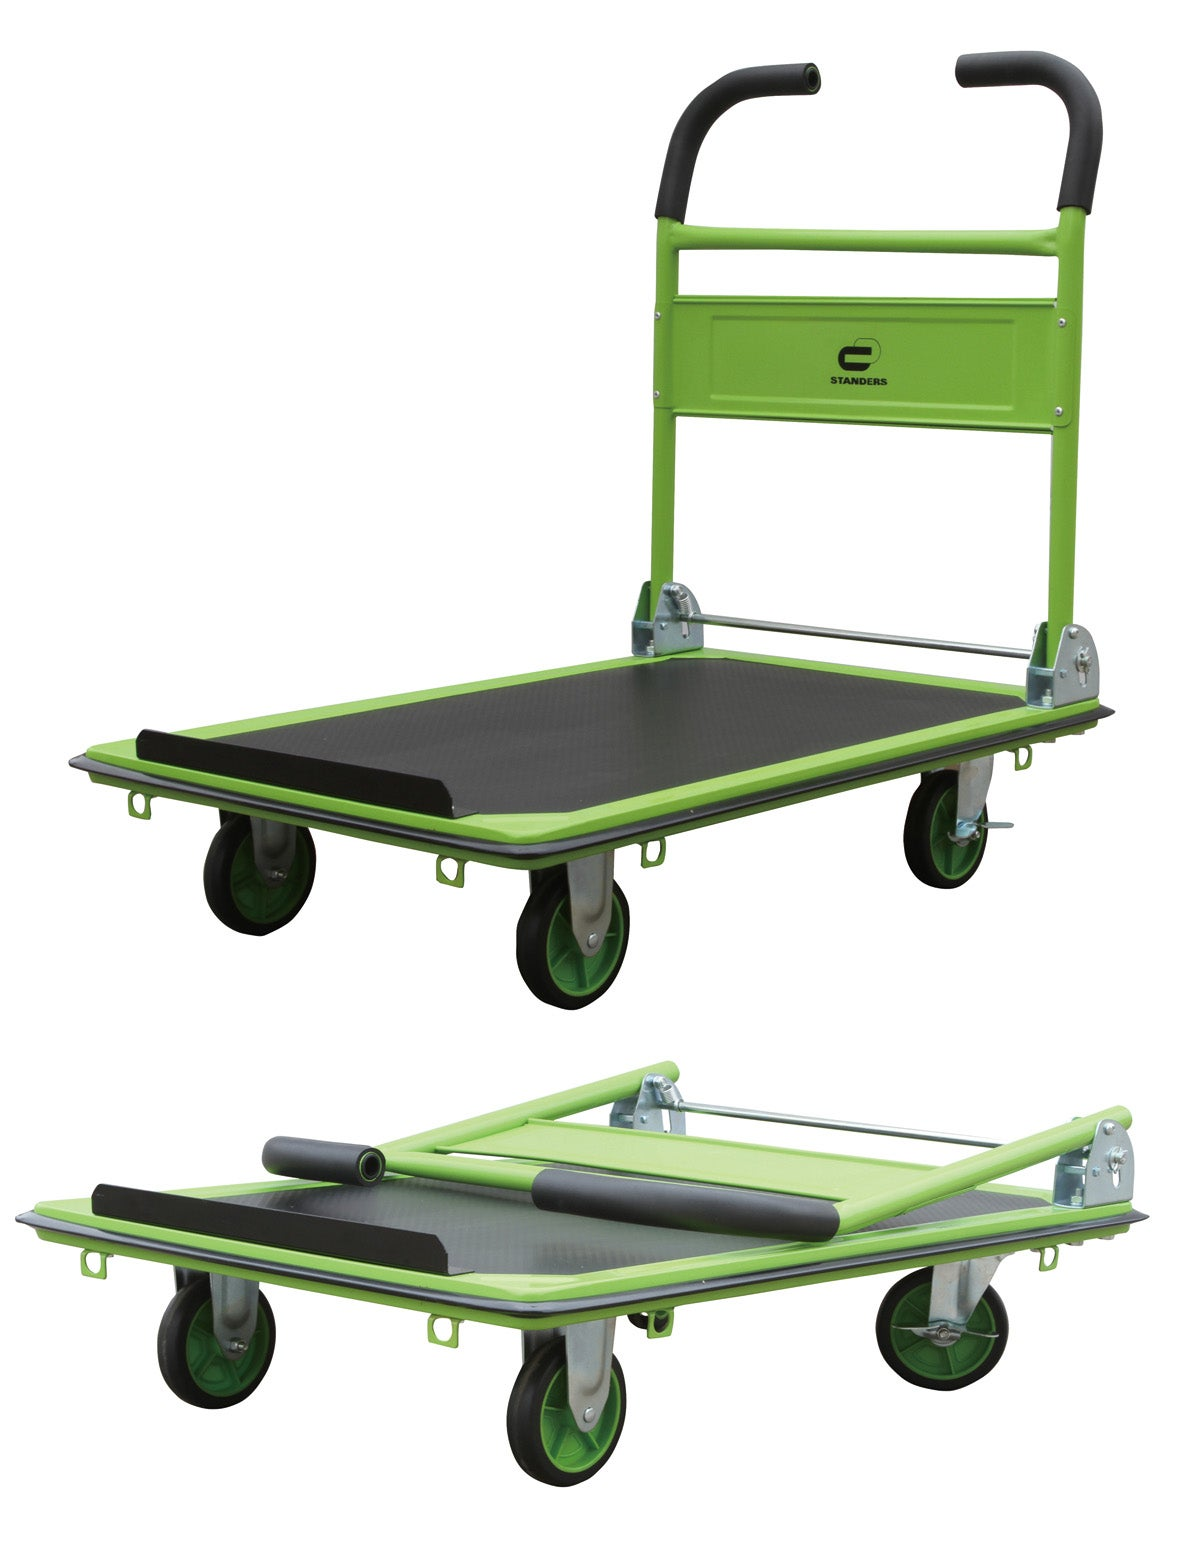 Chariot pliable STANDERS, charge garantie 300 kg